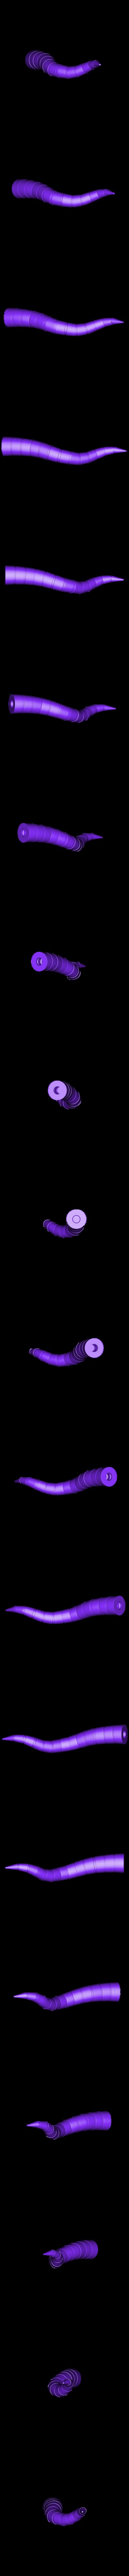 tentacle_01.stl Download free STL file Gowanus Monster - Margo Series • 3D printable object, boldmachines